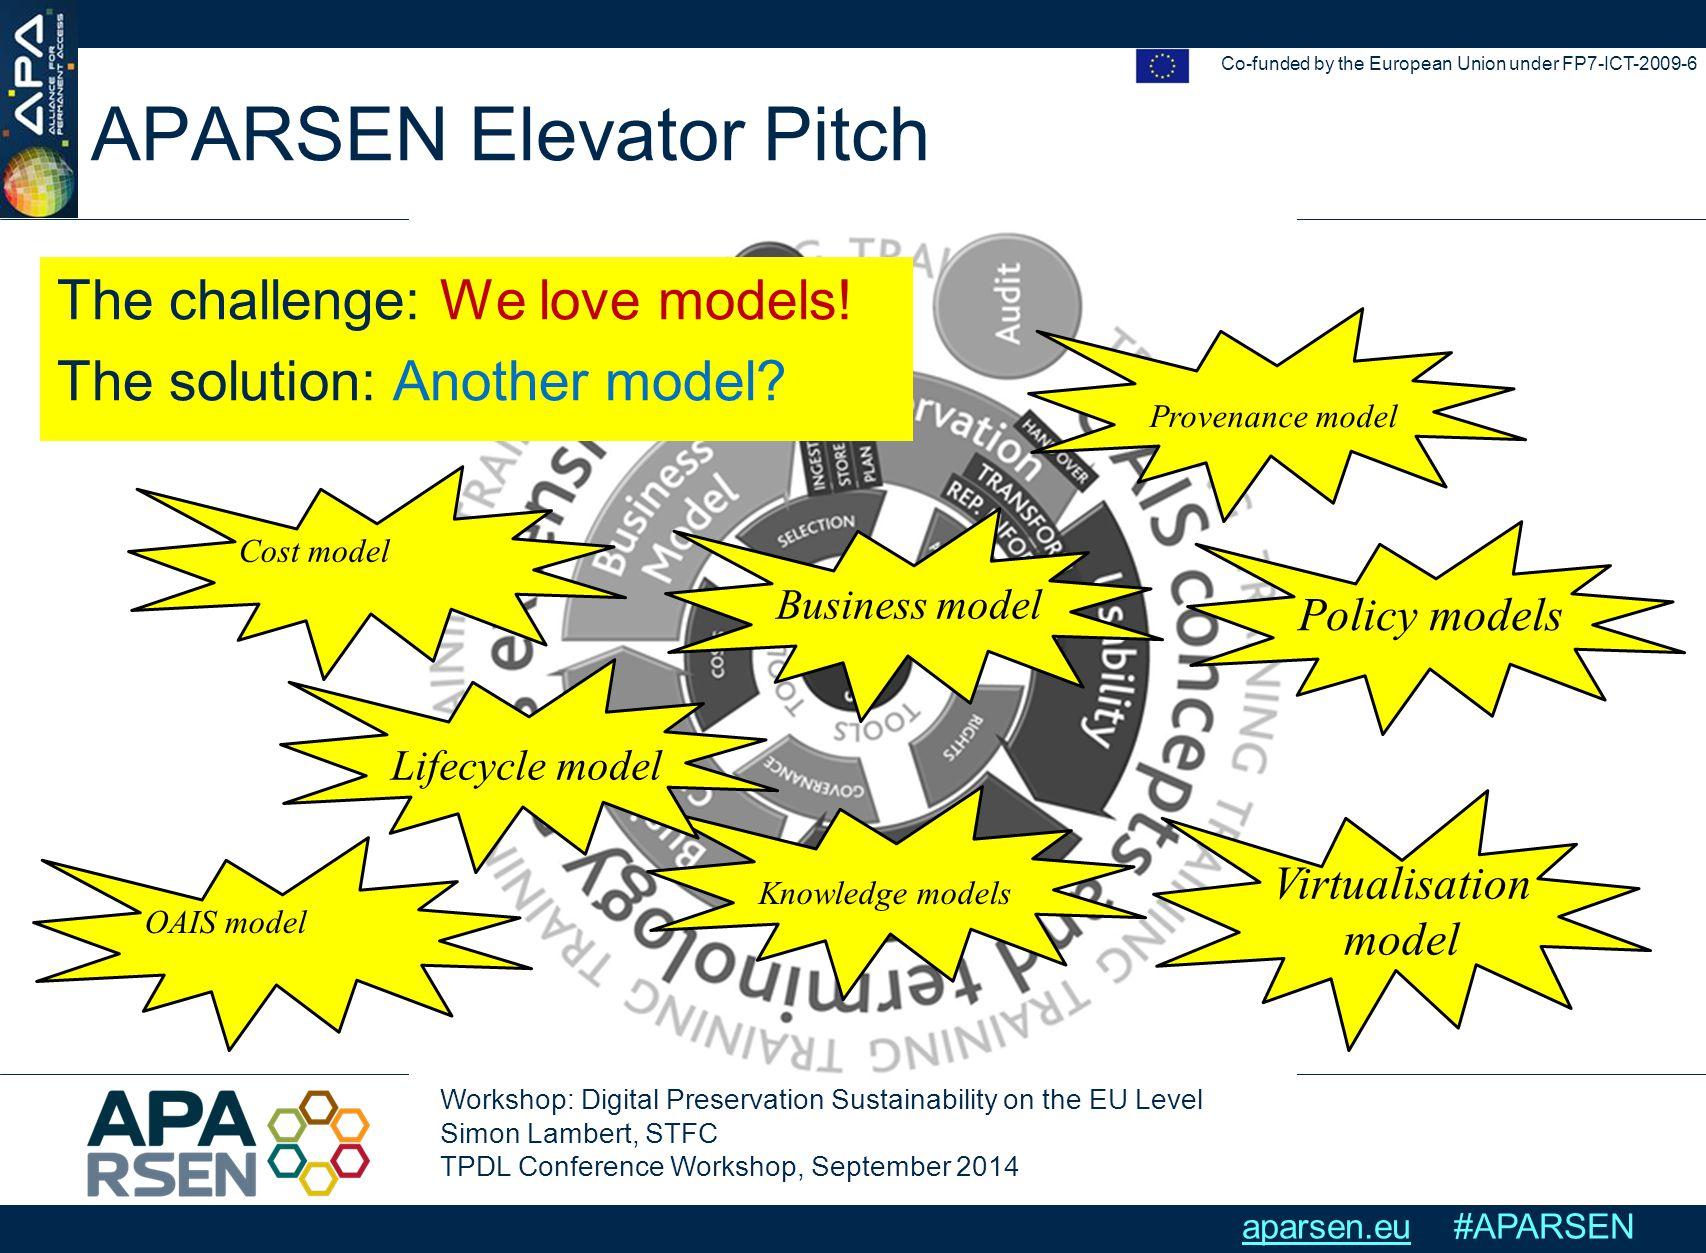 Workshop: Digital Preservation Sustainability on the EU Level Simon Lambert, STFC TPDL Conference Workshop, September 2014 Co-funded by the European Union under FP7-ICT-2009-6 aparsen.eu #APARSEN APARSEN Elevator Pitch The challenge: We love models.